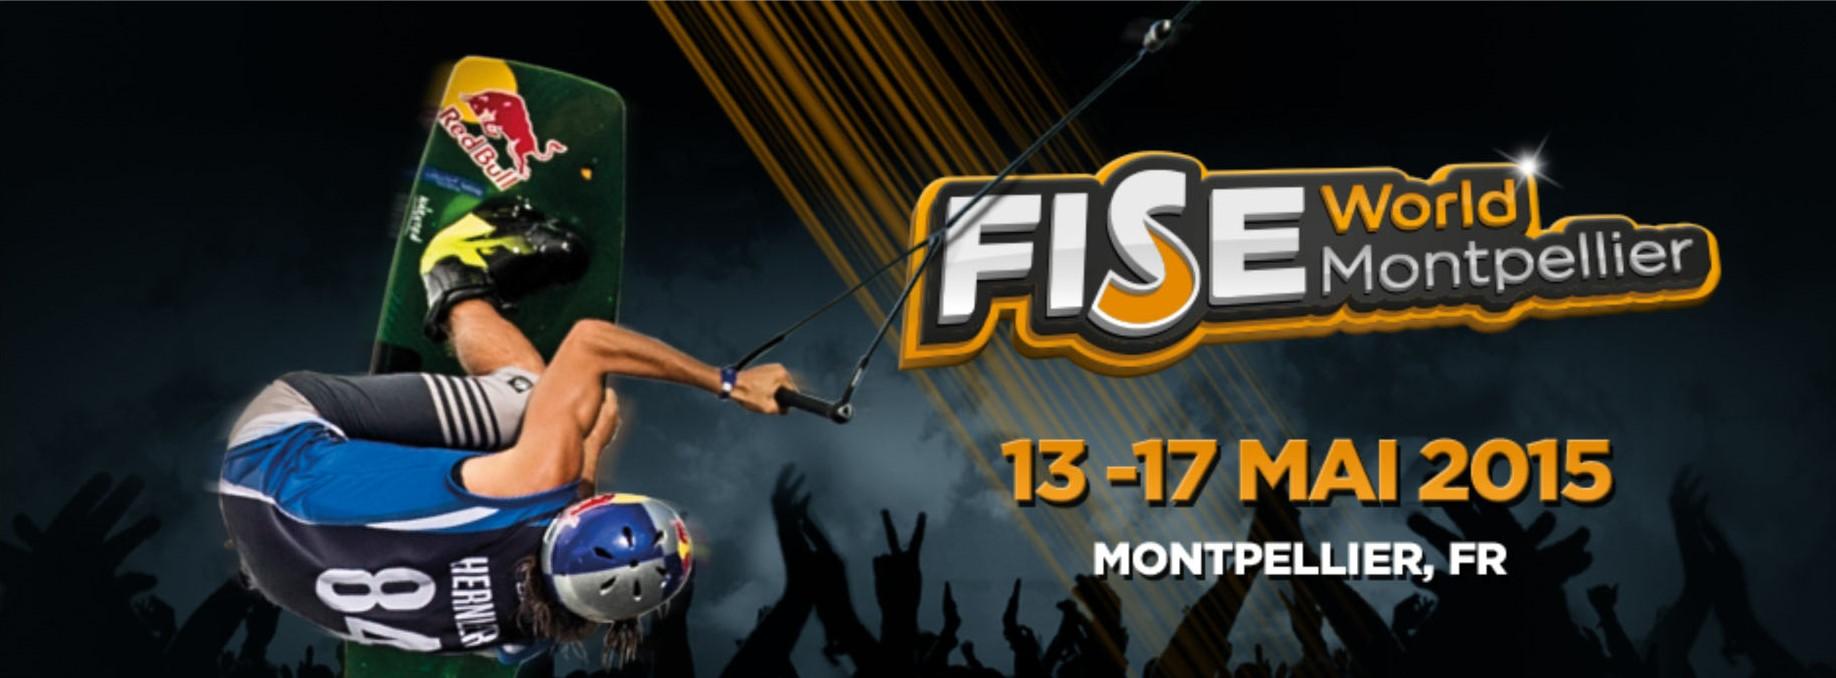 Fise World Montpellier вейкбординг 2015 флаер